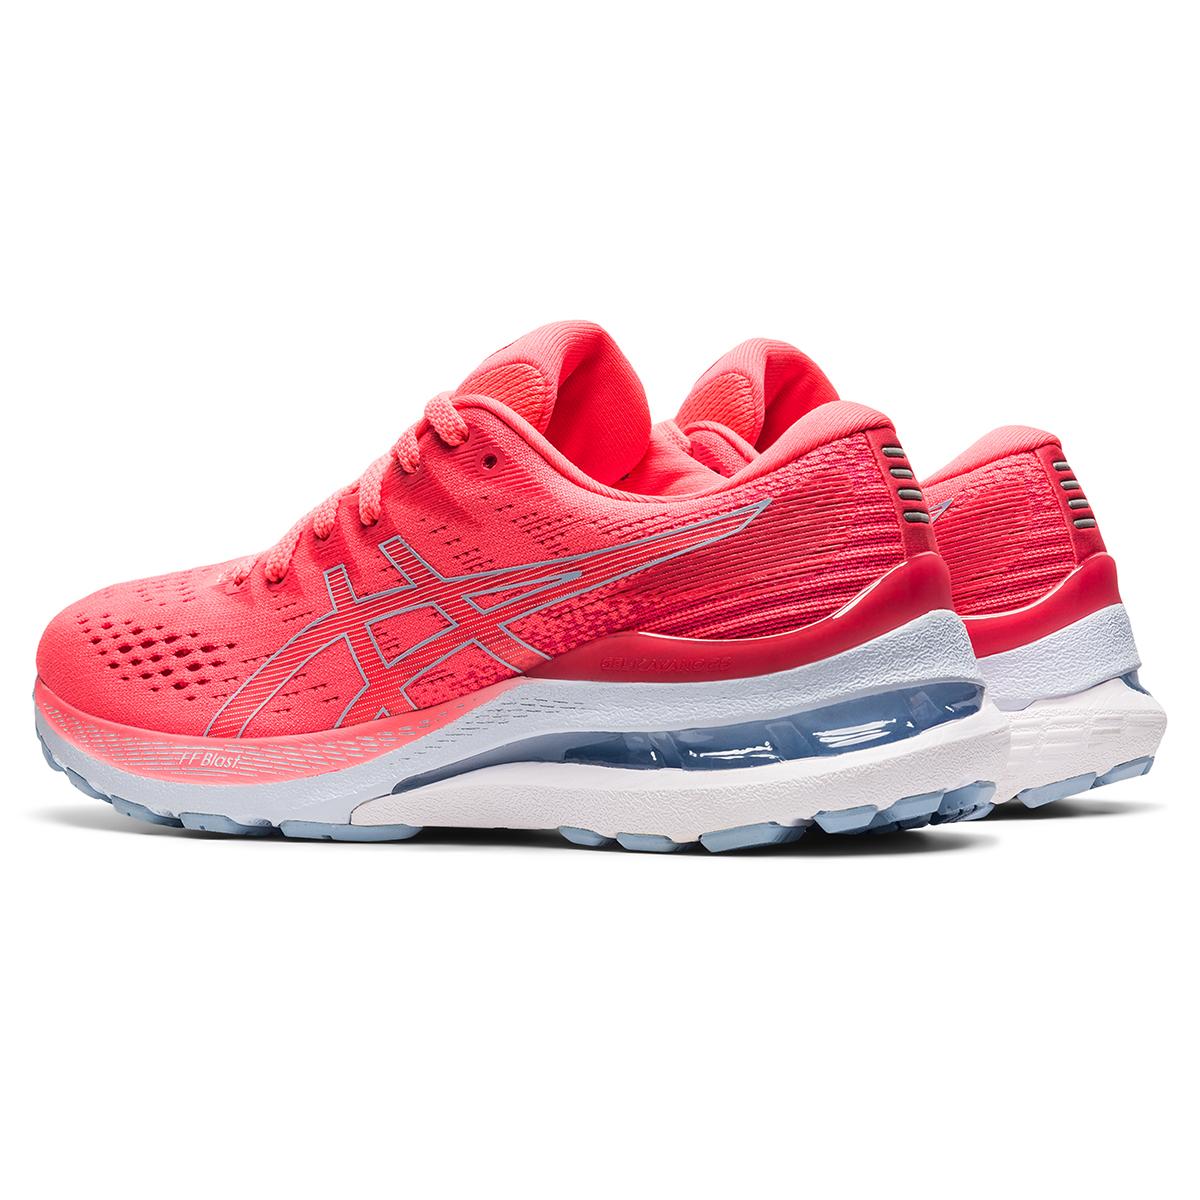 Women's Asics Gel-Kayano 28 Running Shoe - Color: Blazing Coral - Size: 5 - Width: Regular, Blazing Coral, large, image 6